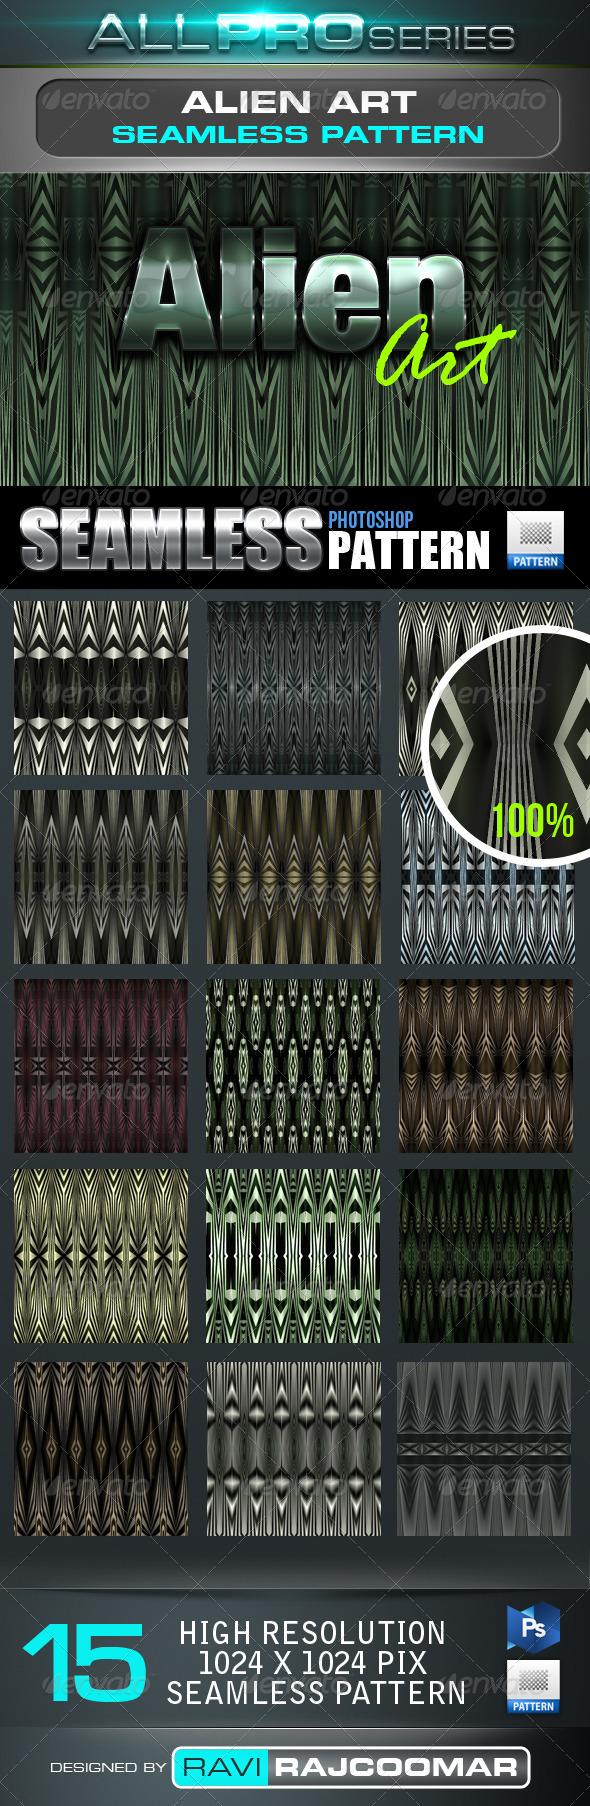 Alien Art Seamless-Tileable Photoshop Patern - Techno / Futuristic Textures / Fills / Patterns